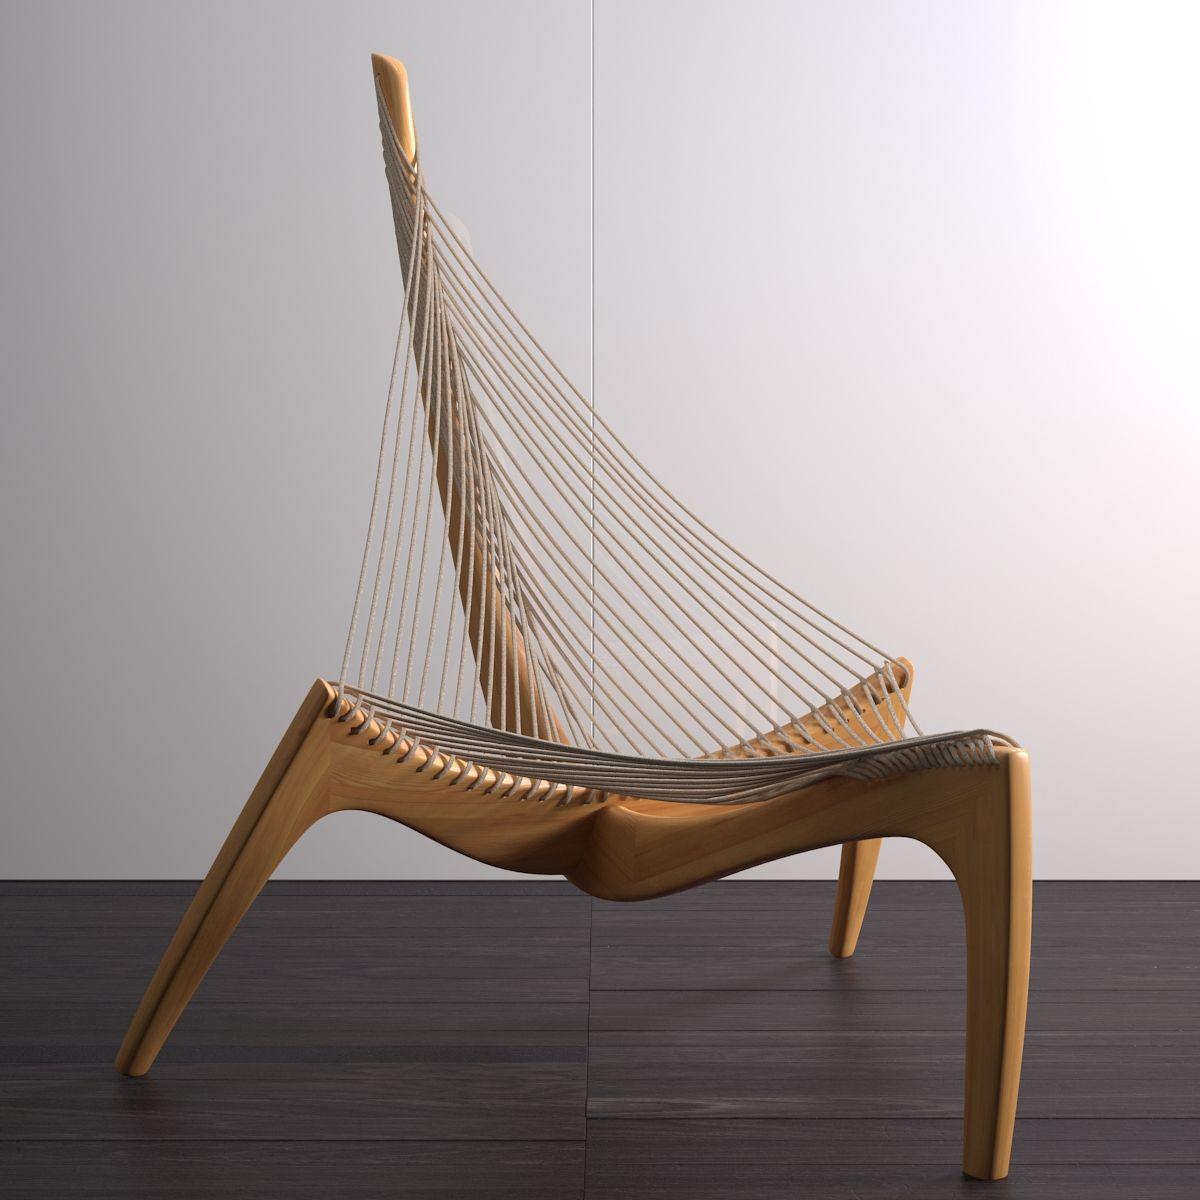 Scandinavian Furniture Design   {E}vermotion   Forum; Chair Design By  Jorgen Hovelskov